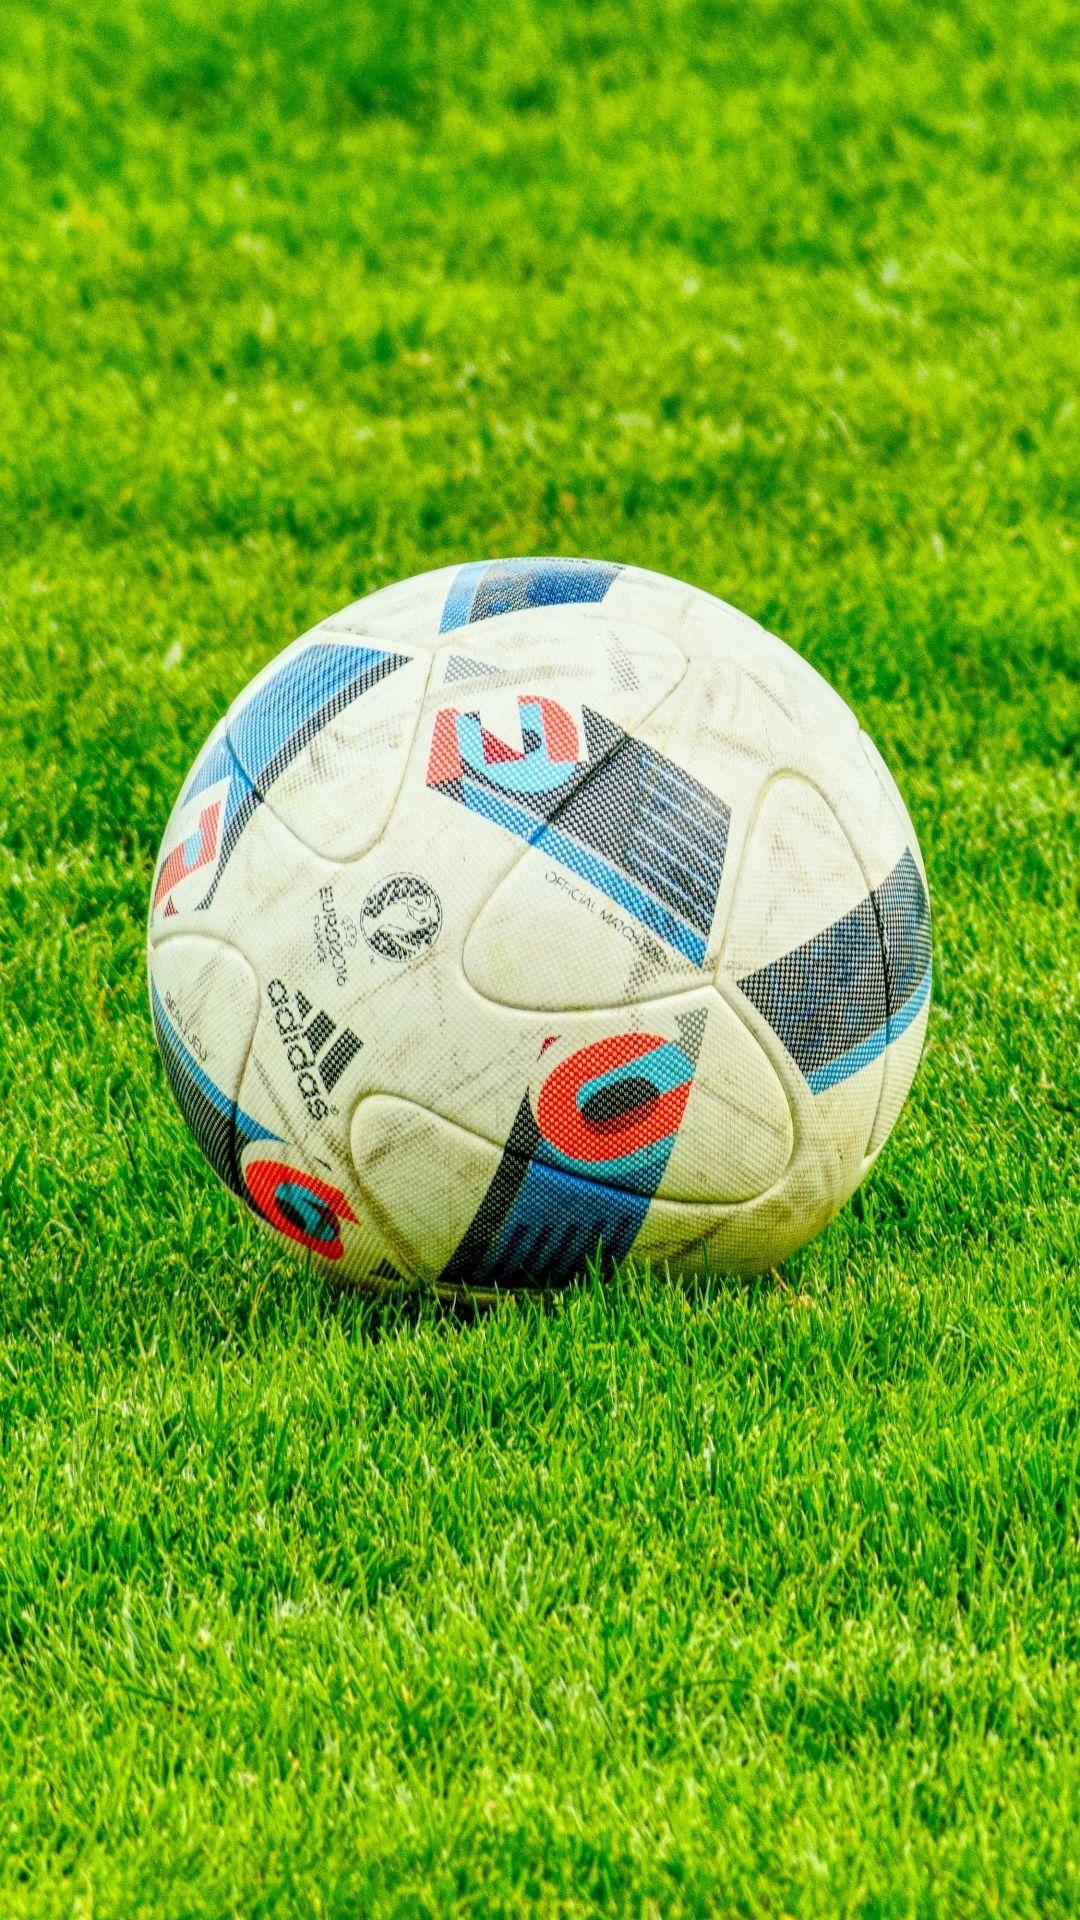 Sports Soccer 1080x1920 Mobile Wallpaper Soccer Sport Soccer Sports